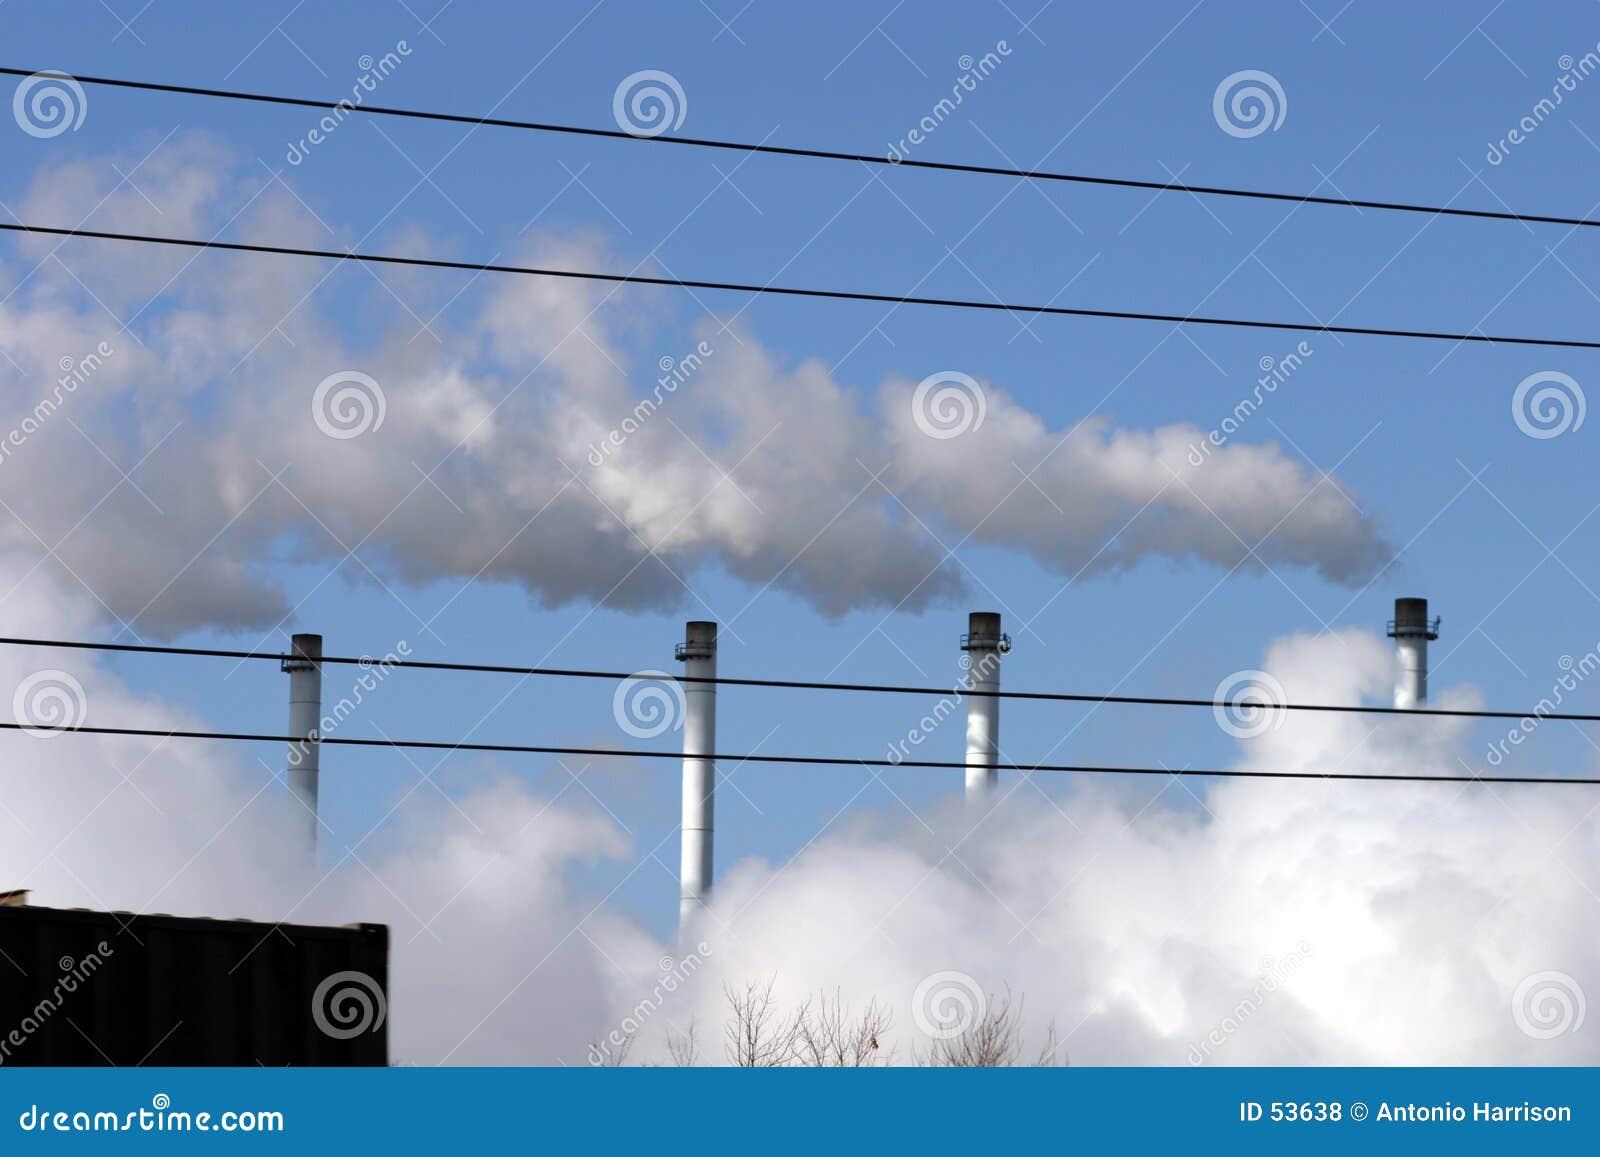 Download ατμός στοκ εικόνες. εικόνα από σωλήνες, εργοστάσιο, βιομηχανία - 53638